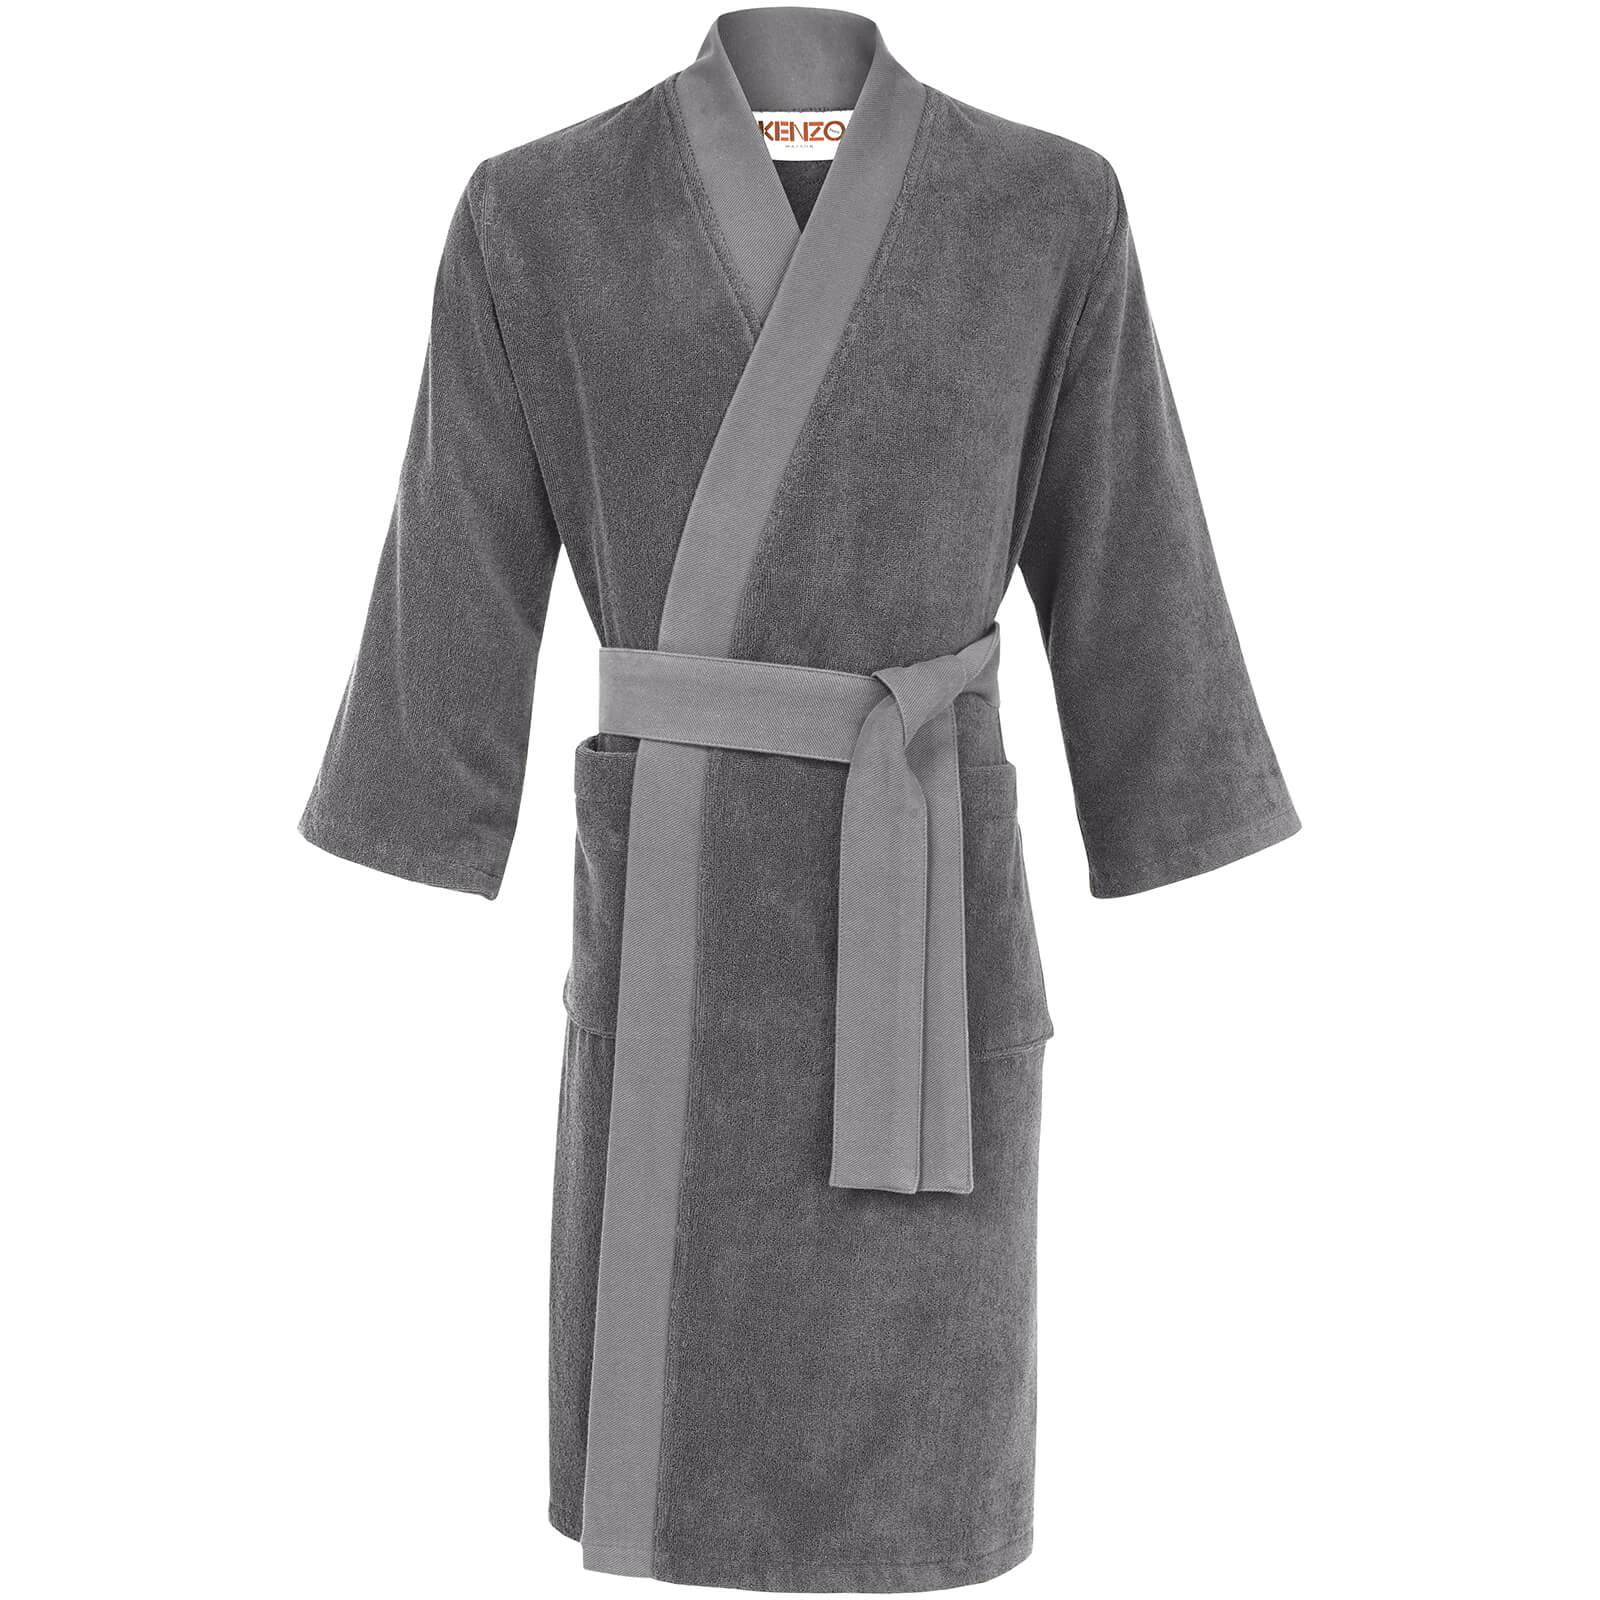 95225d81ca KENZO Iconic Bathrobe - Grey - Free UK Delivery over £50